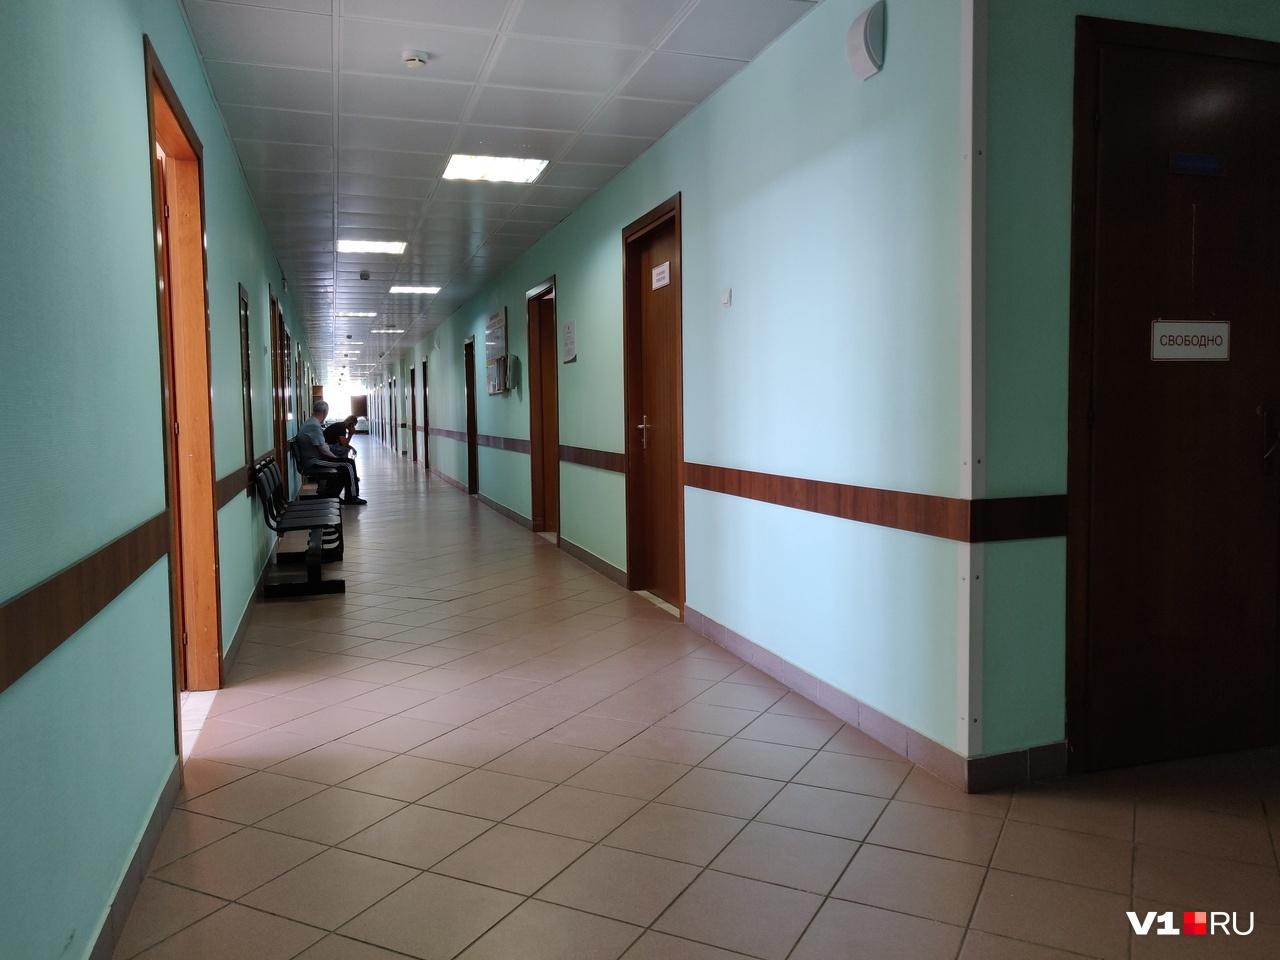 В больнице найти Нтире не удалось